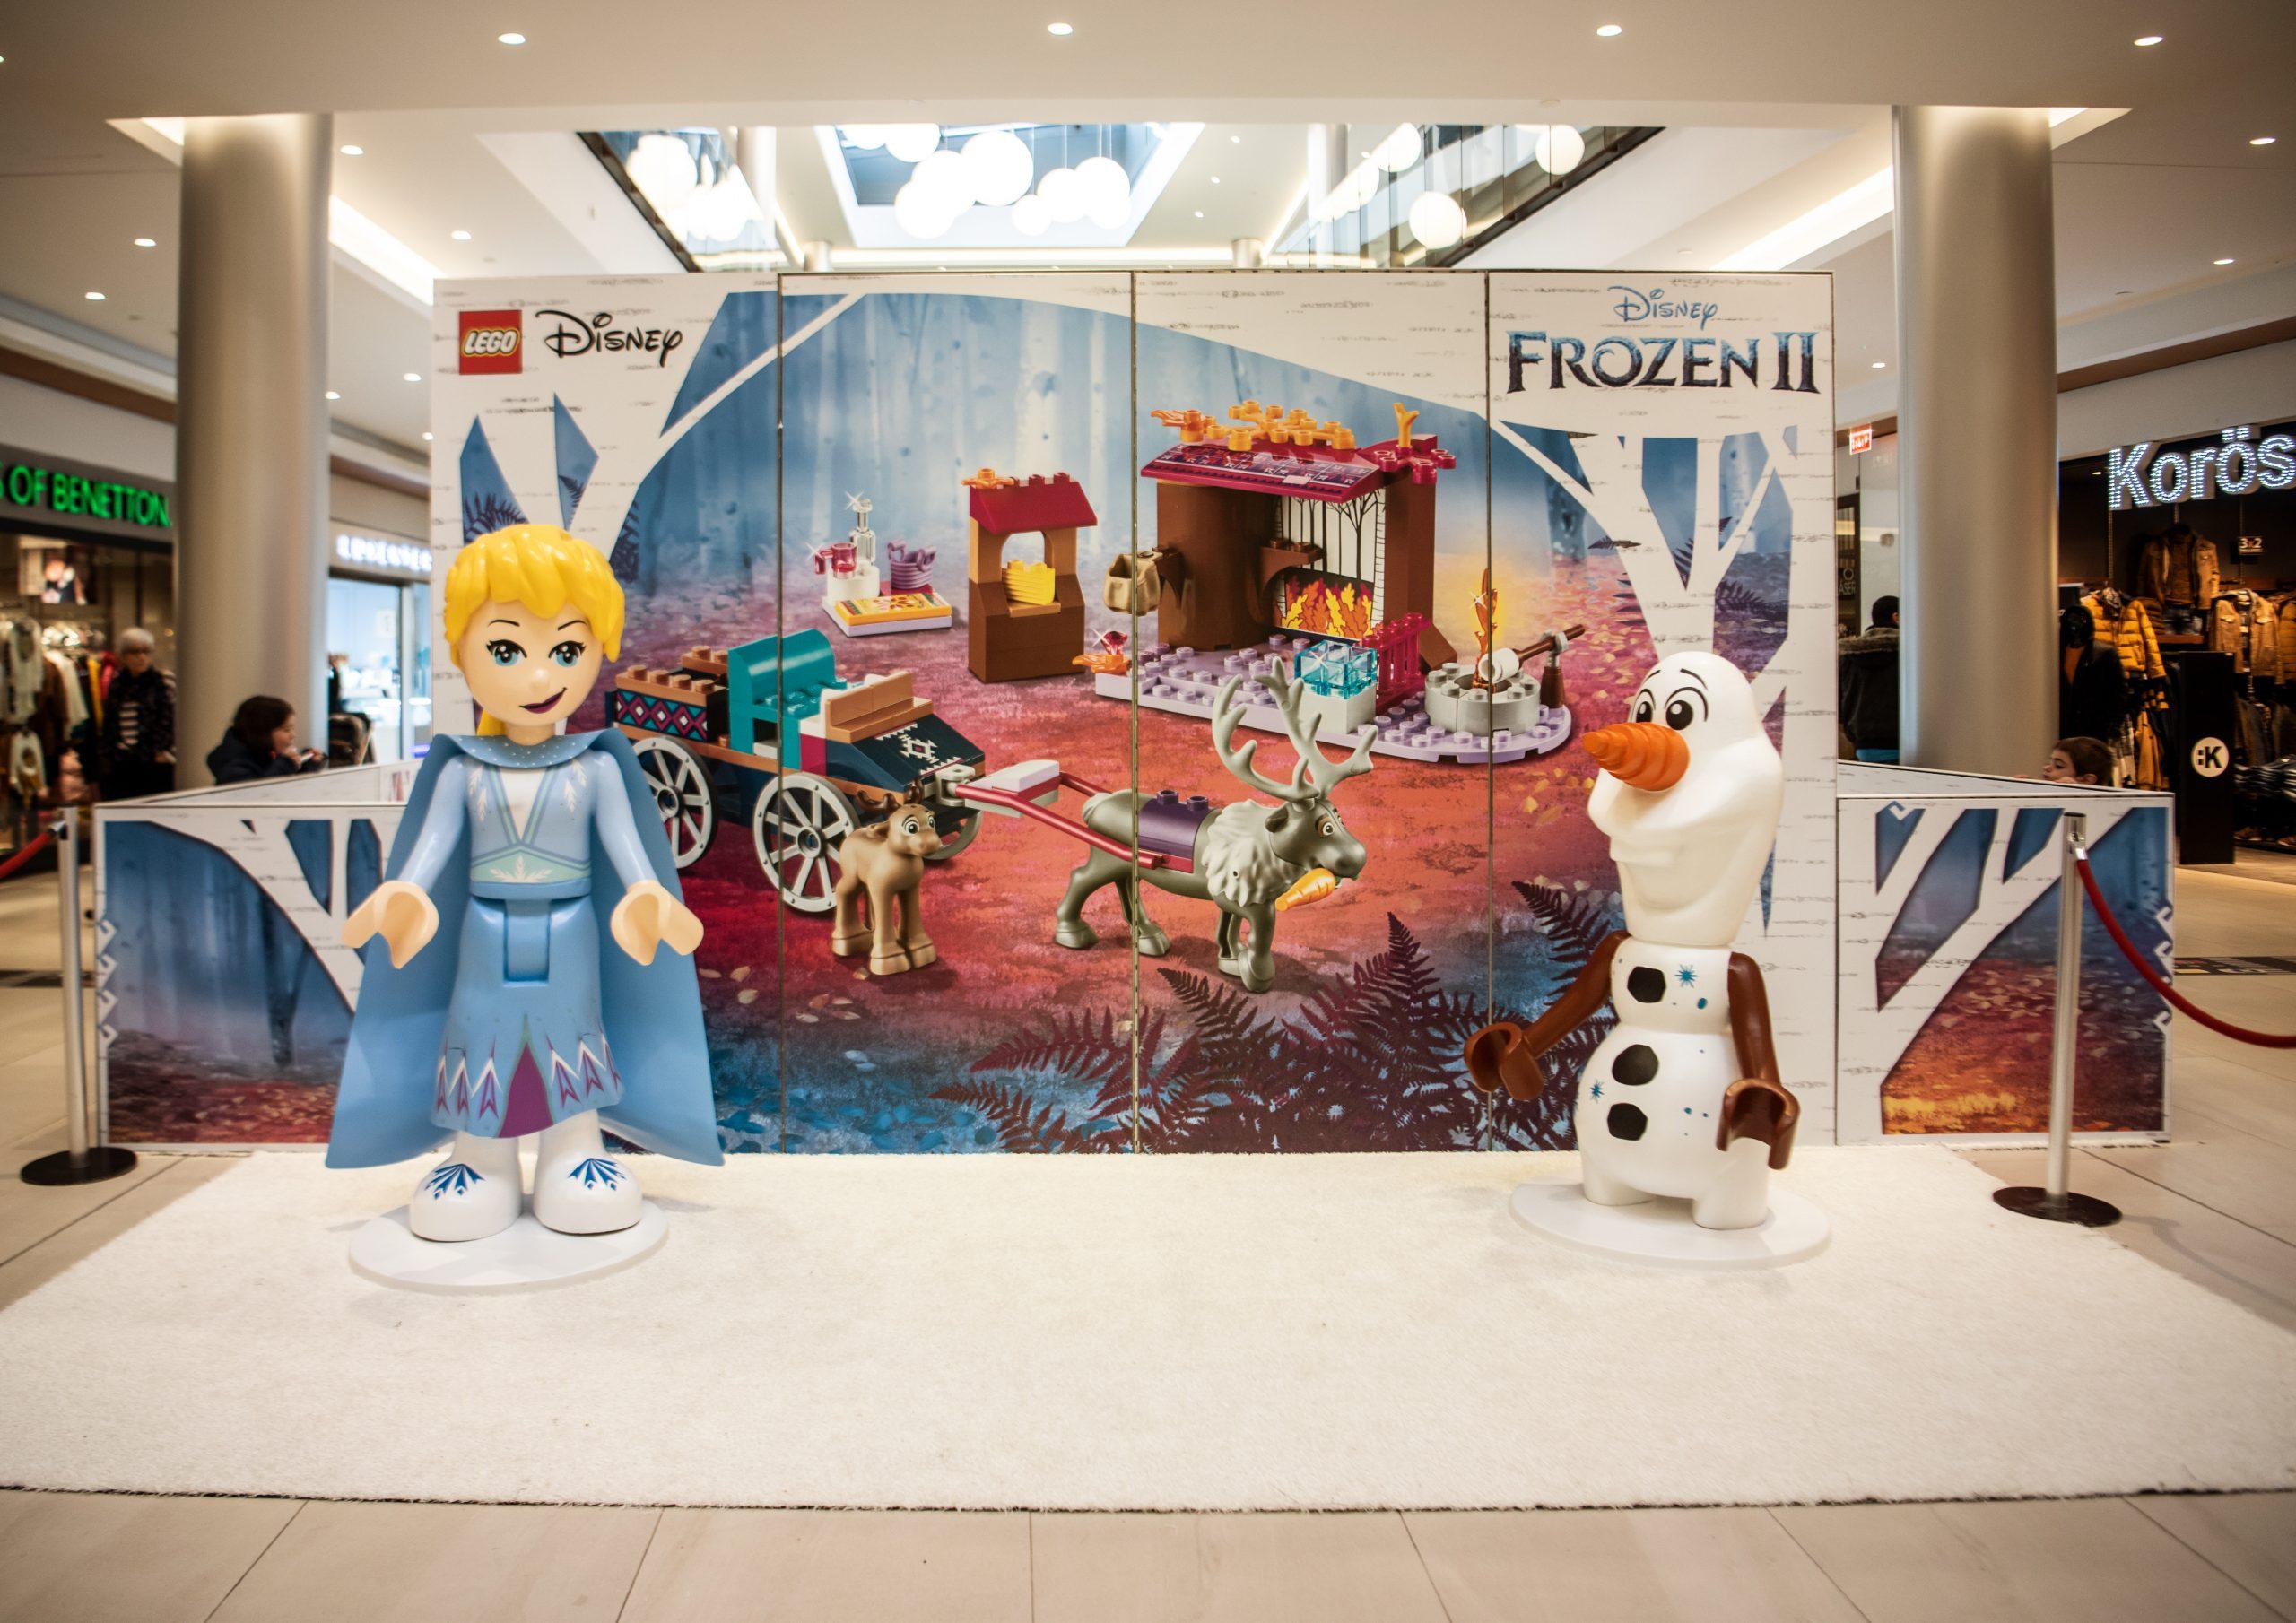 LEGO® FROZEN EVENT – LEGO®